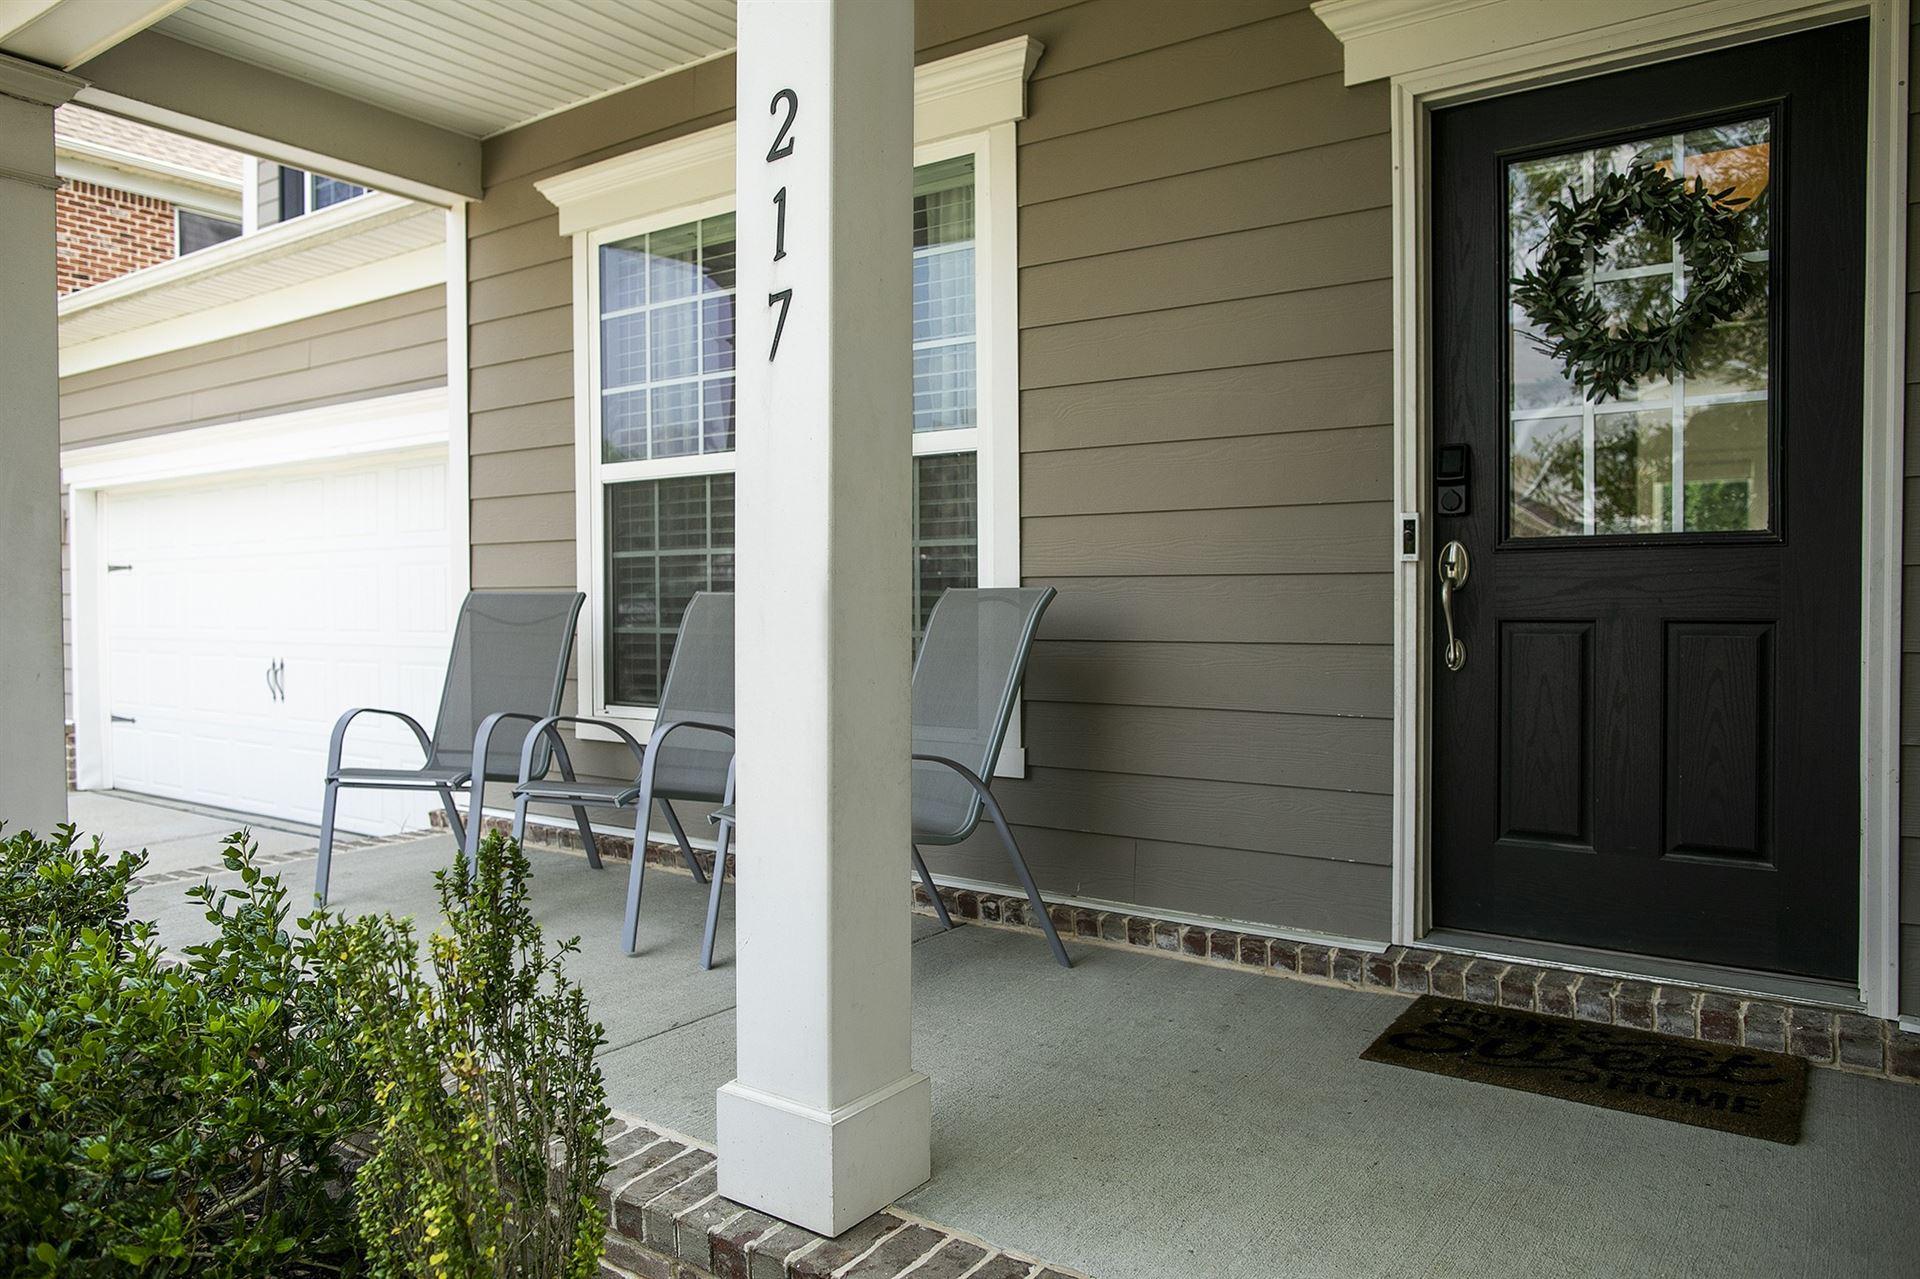 Photo of 217 Creekstone Blvd, Franklin, TN 37064 (MLS # 2276394)